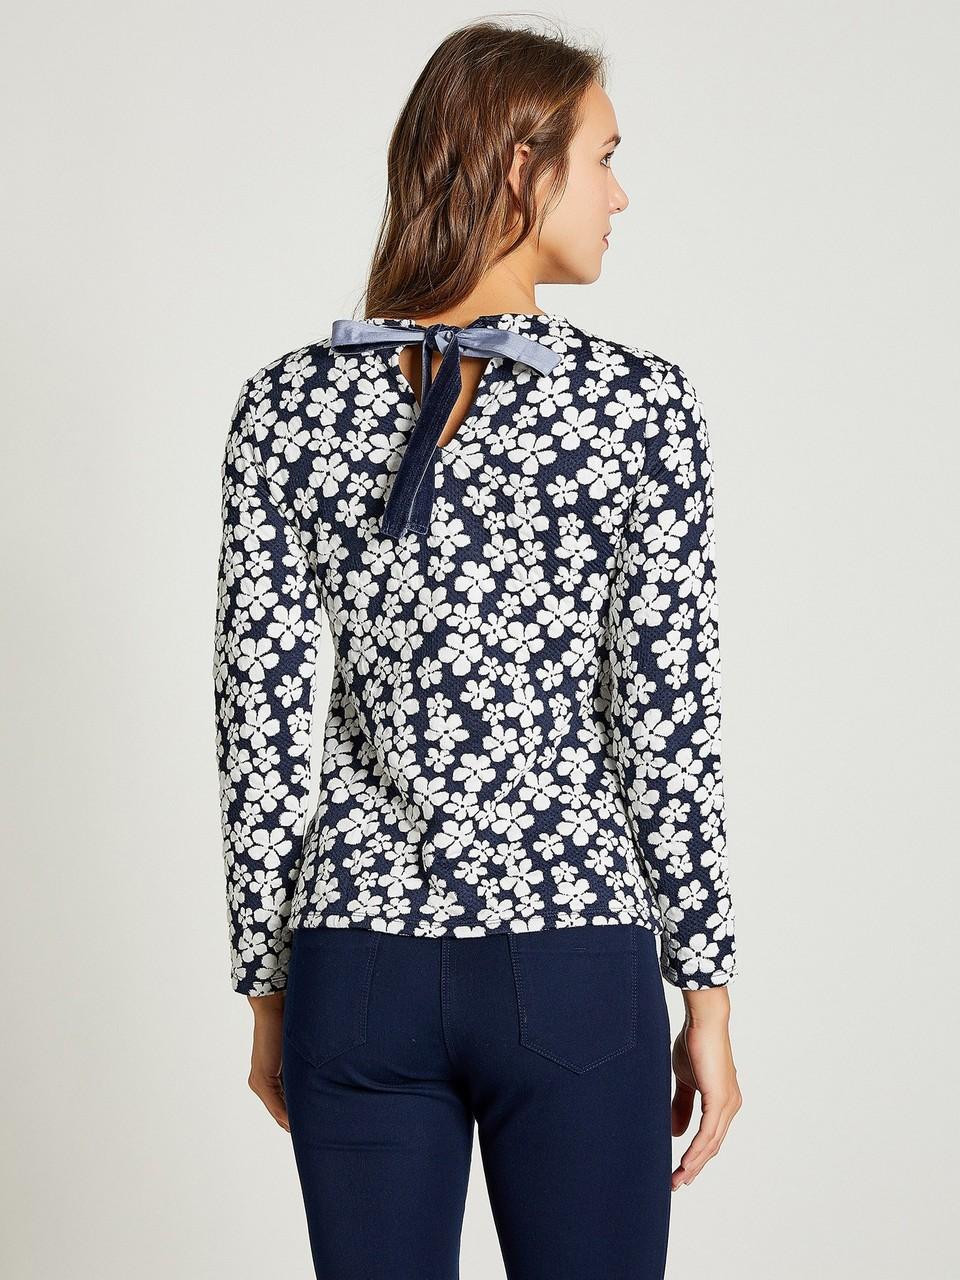 Çiçek Desenli Pamuklu Bluz